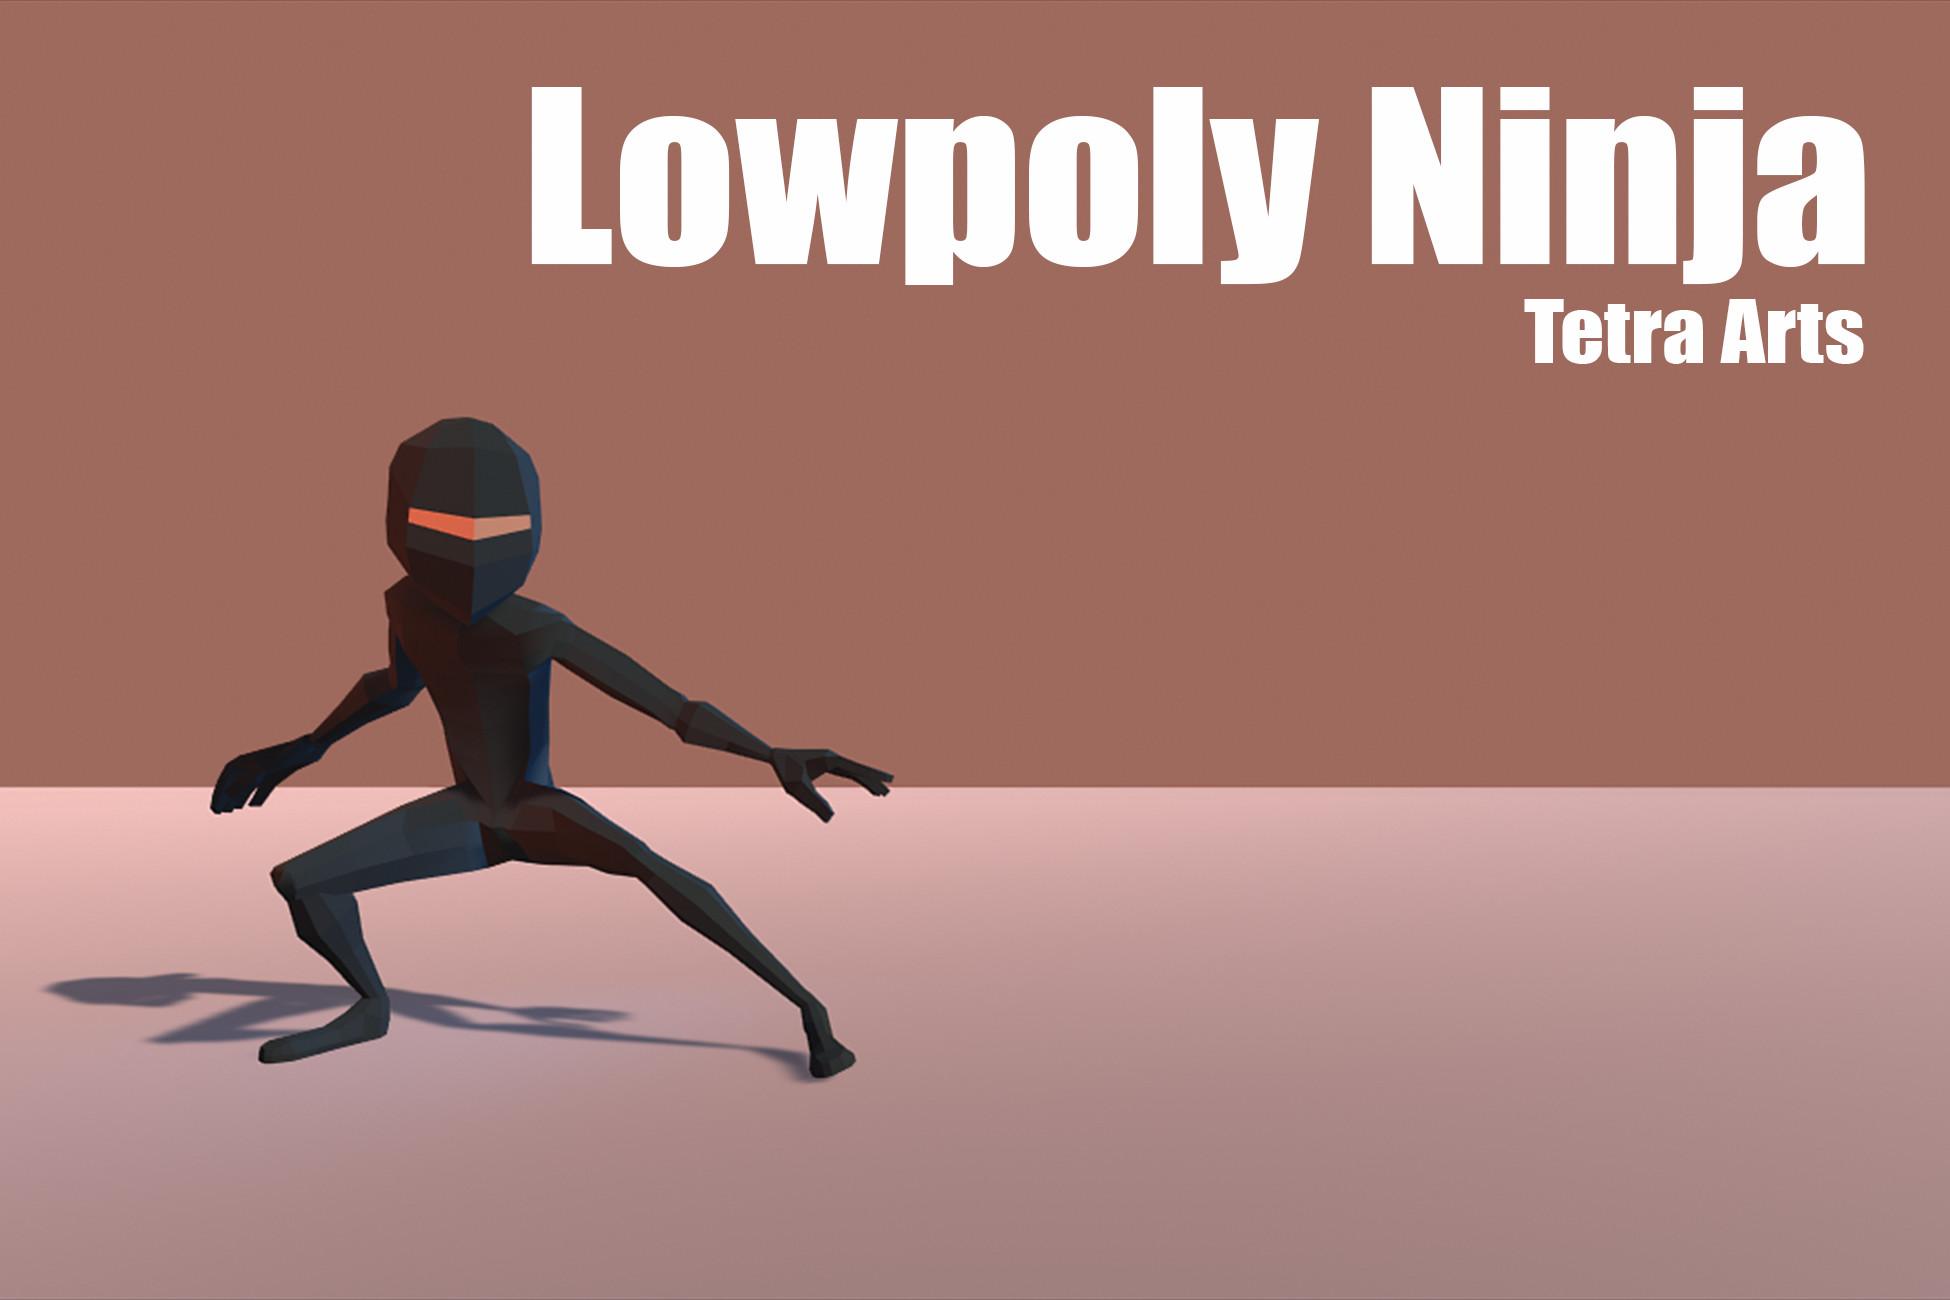 Lowpoly ninja